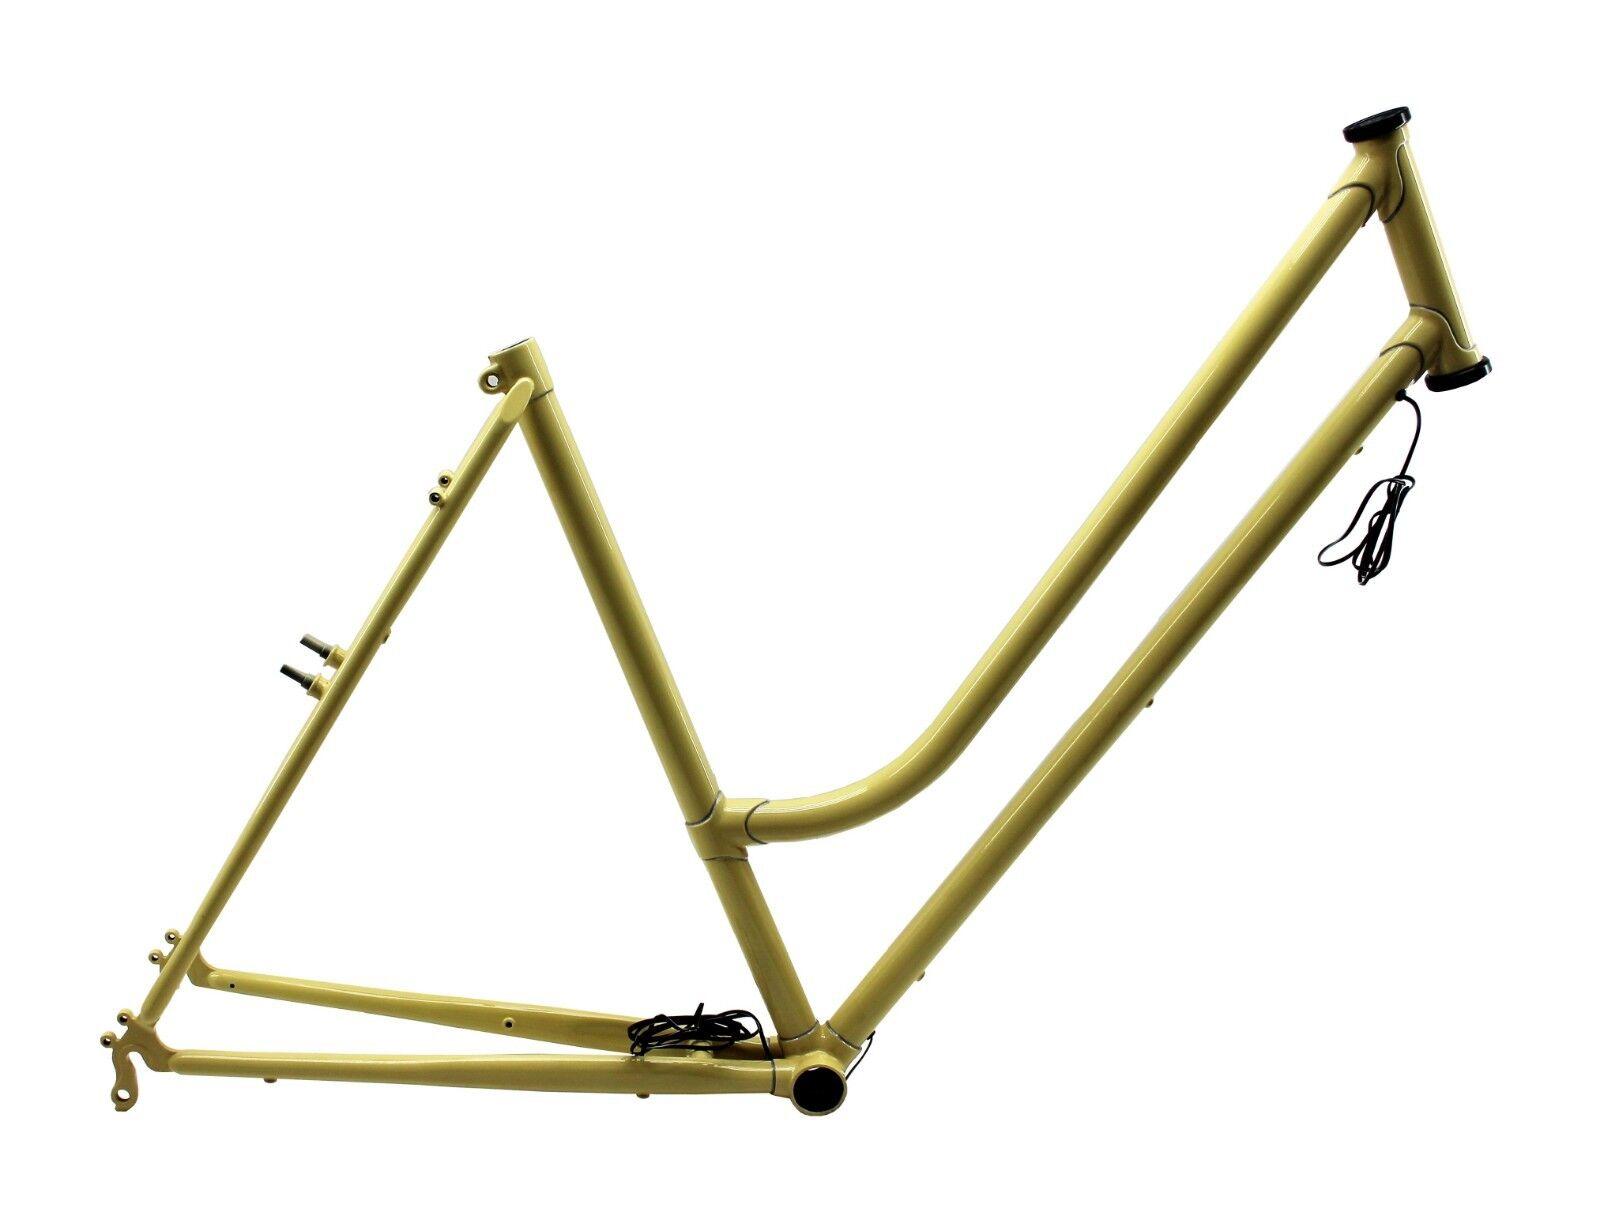 Acero Cuadro Bicicleta Nostalgia 28  , Rh 55cm,Ketteschaltung,BSA Lagermaß